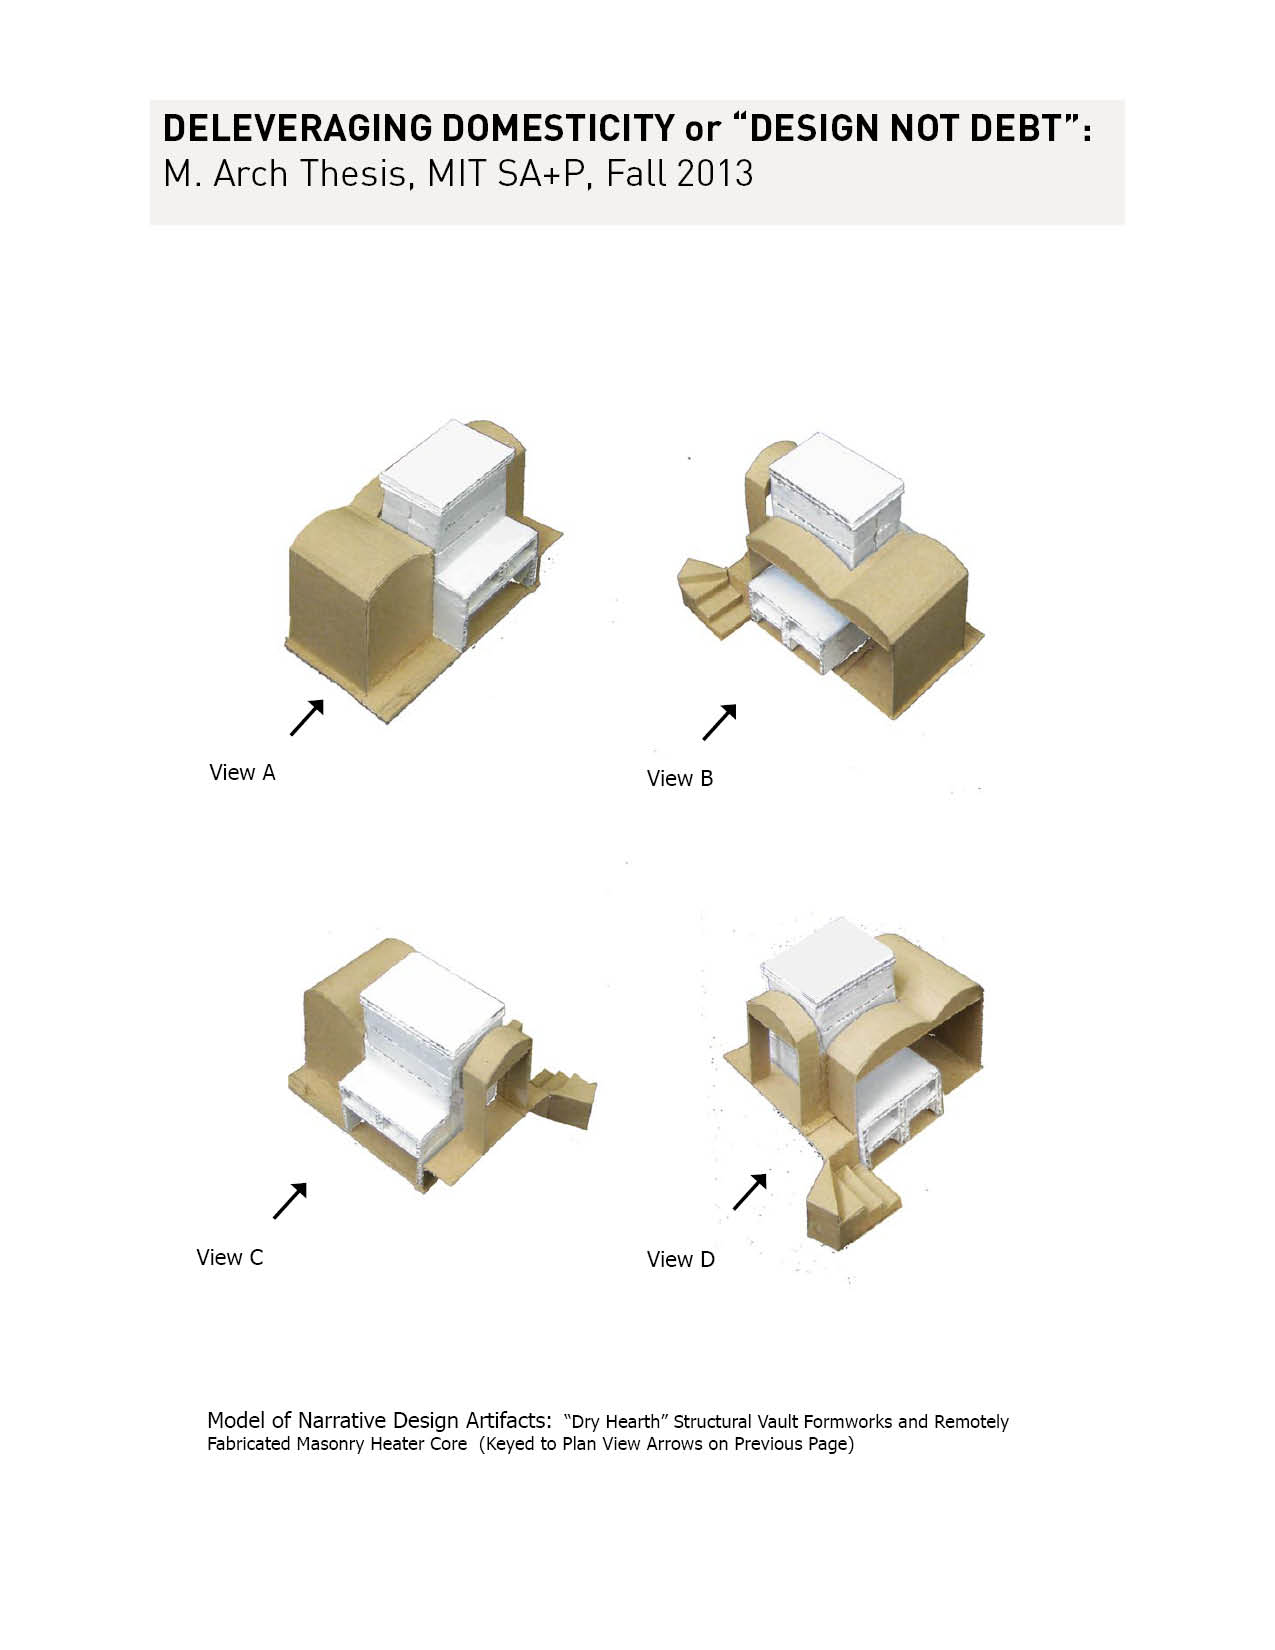 MIT_thesis40.jpg